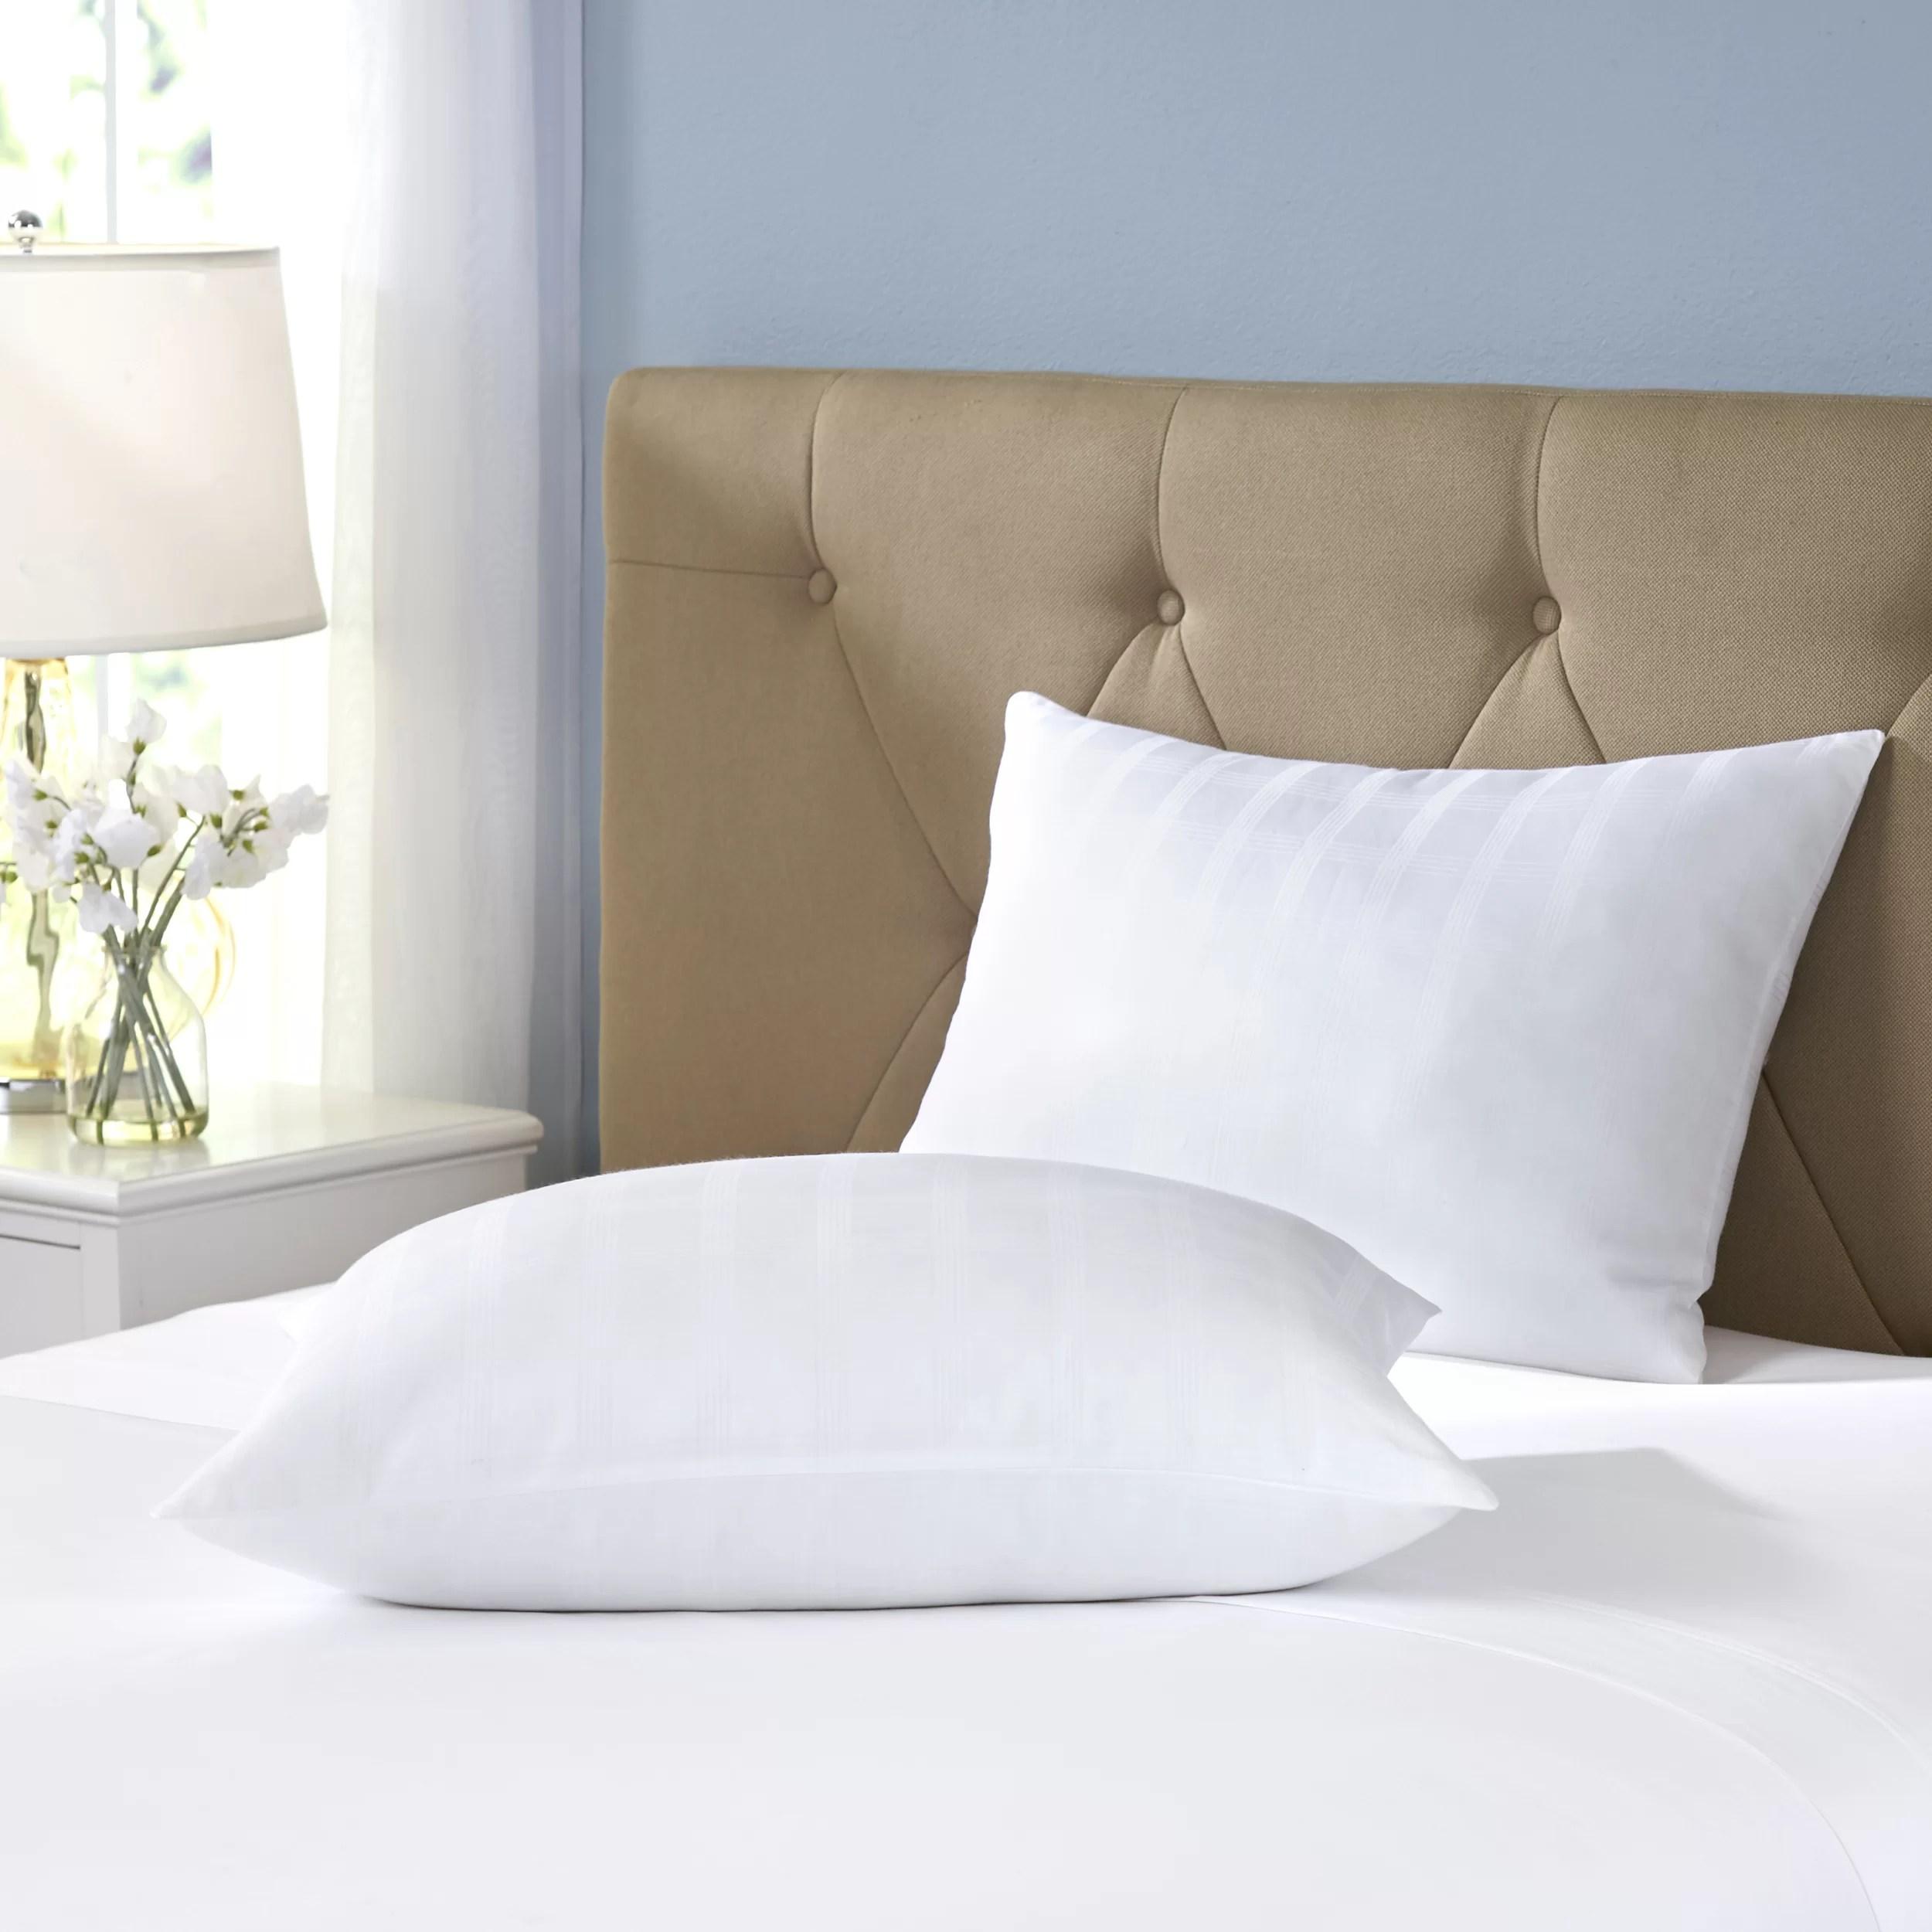 Wayfair Sleep Wayfair Sleep Gel Fiber Pillow & Reviews